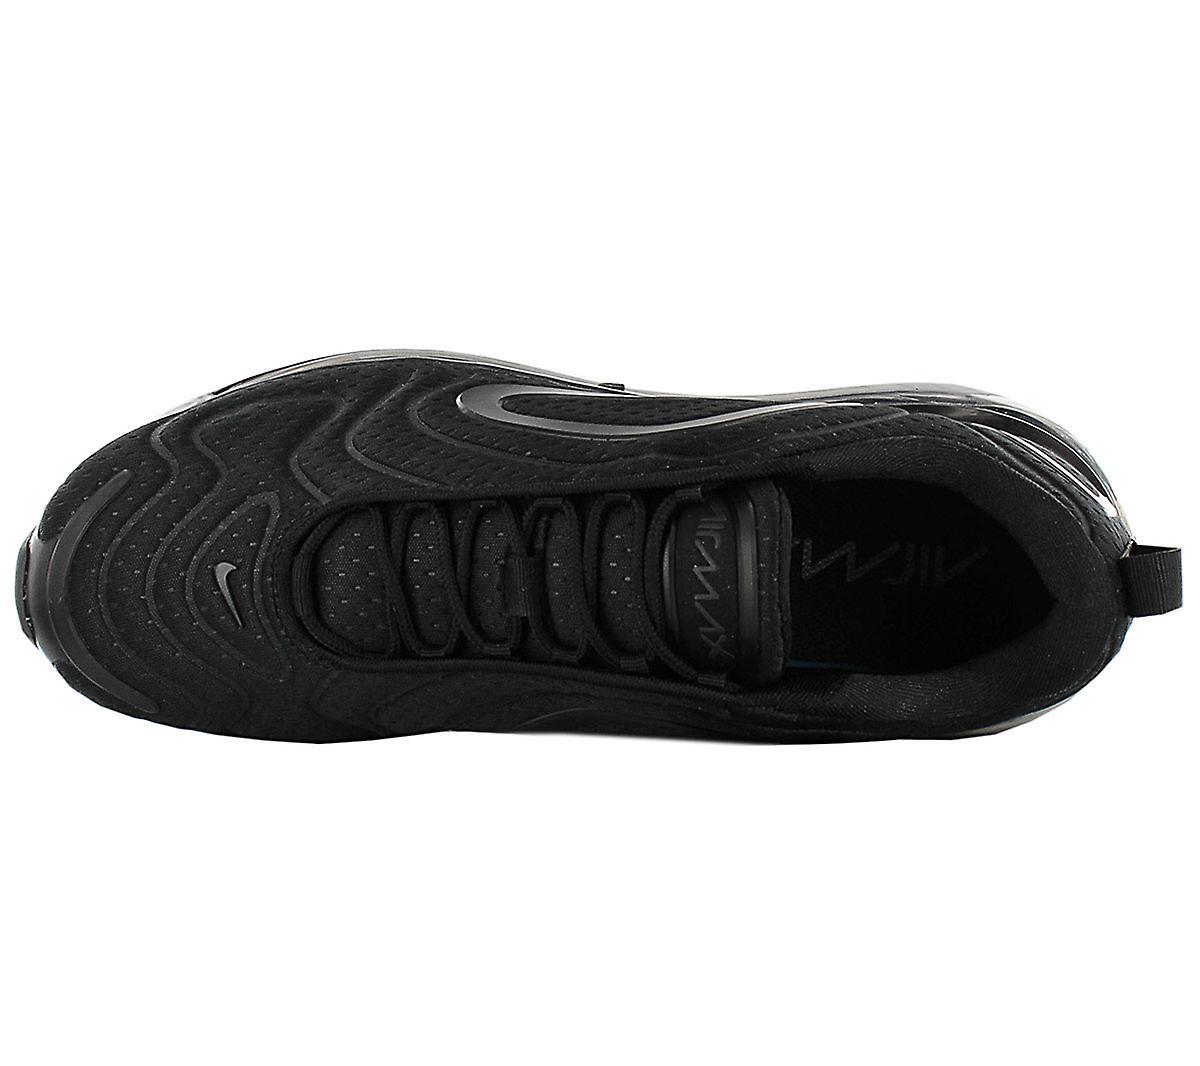 Nike Air Max 720 - Chaussures Hommes Noir AO2924-015 Chaussures de sport Sneakers